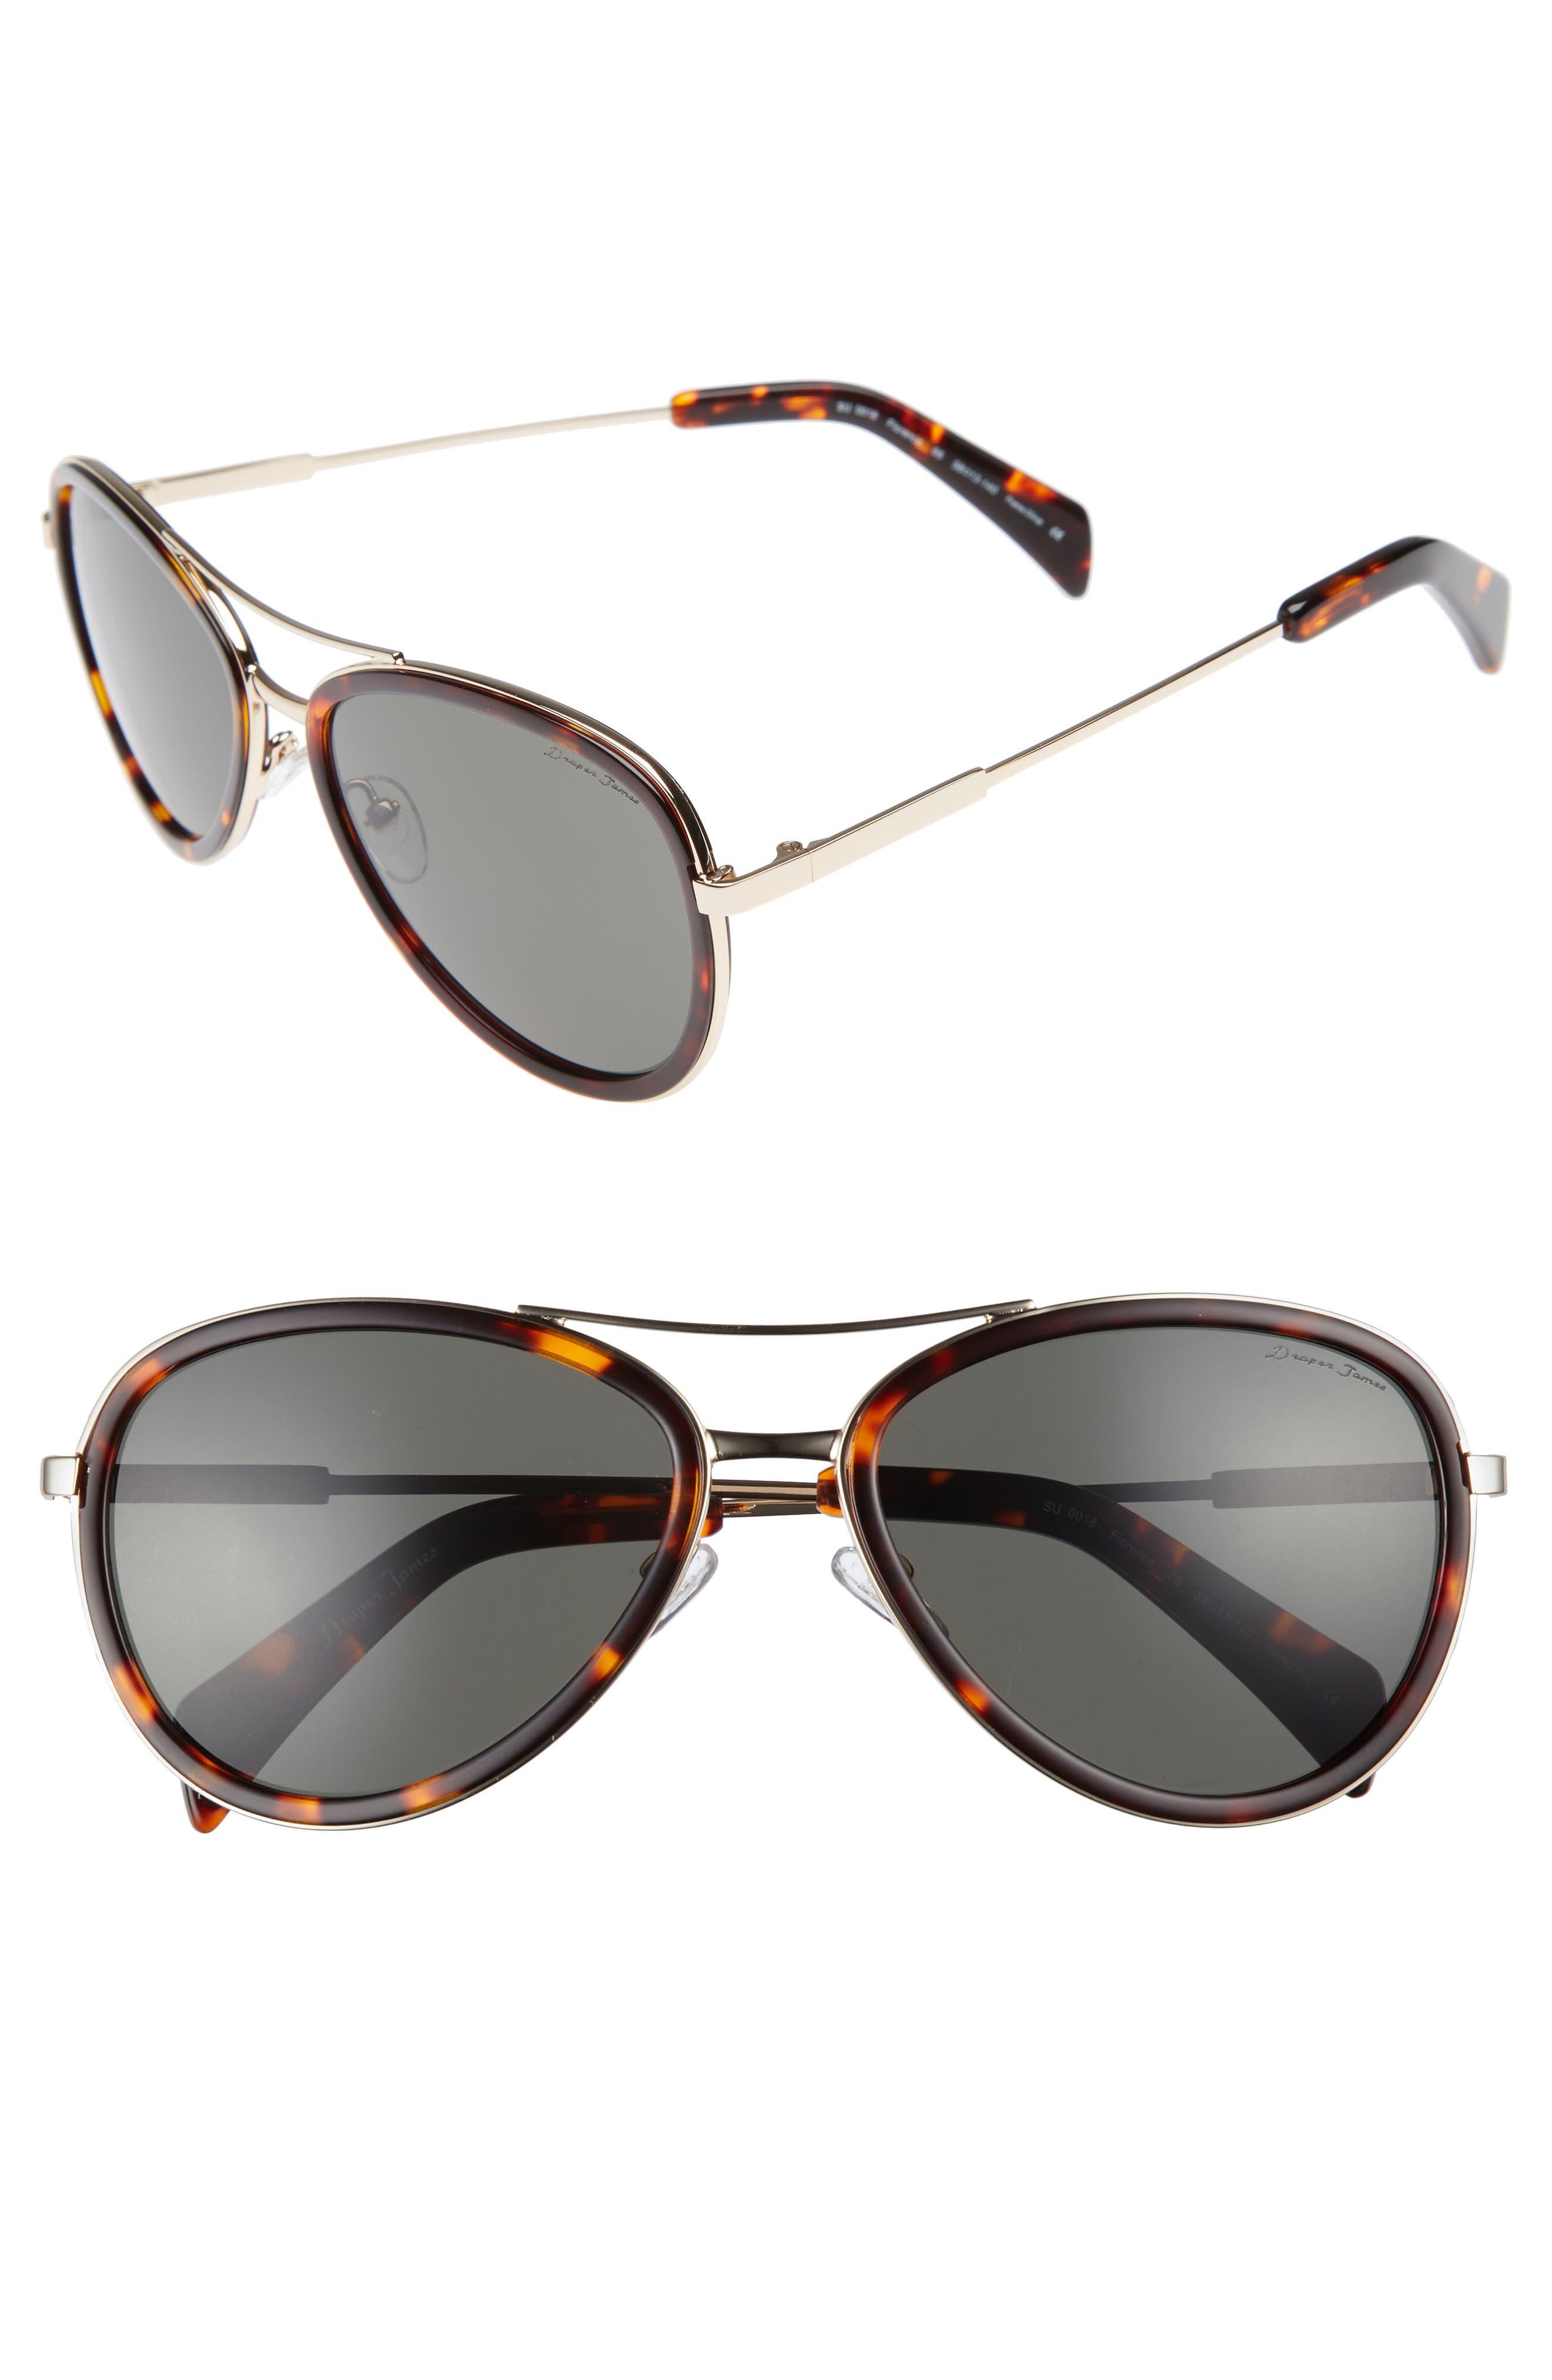 58mm Aviator Sunglasses,                         Main,                         color, GOLD